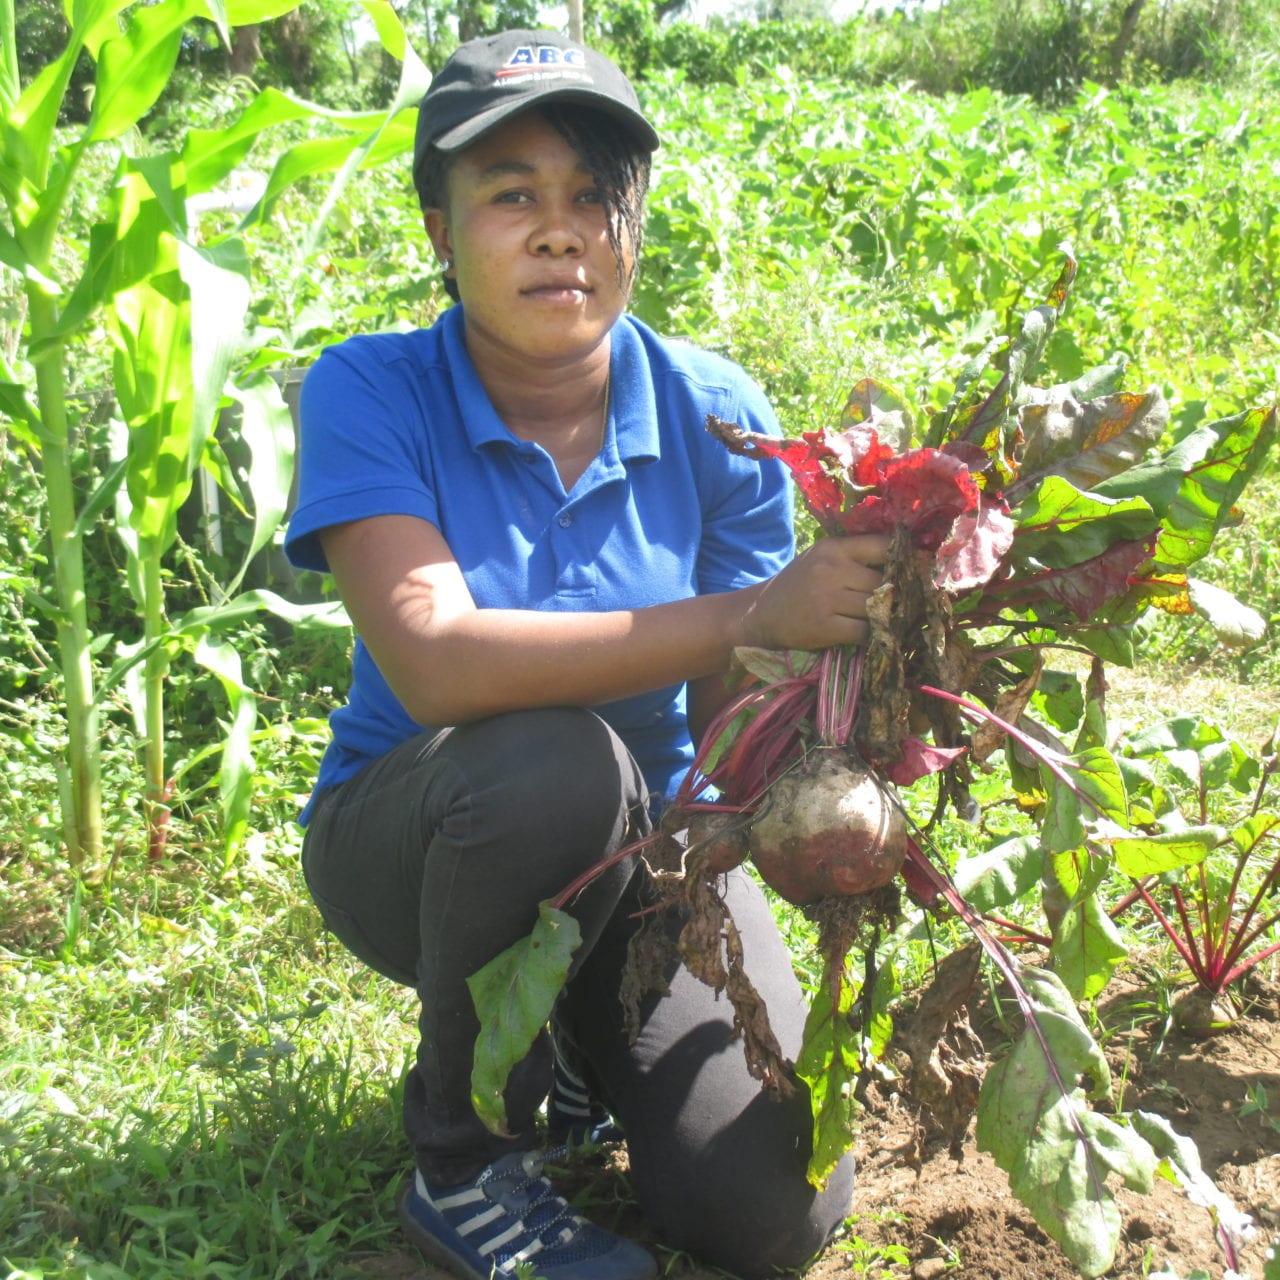 150311 CAP ag SREDD garden xpr beets harvest intern women 2